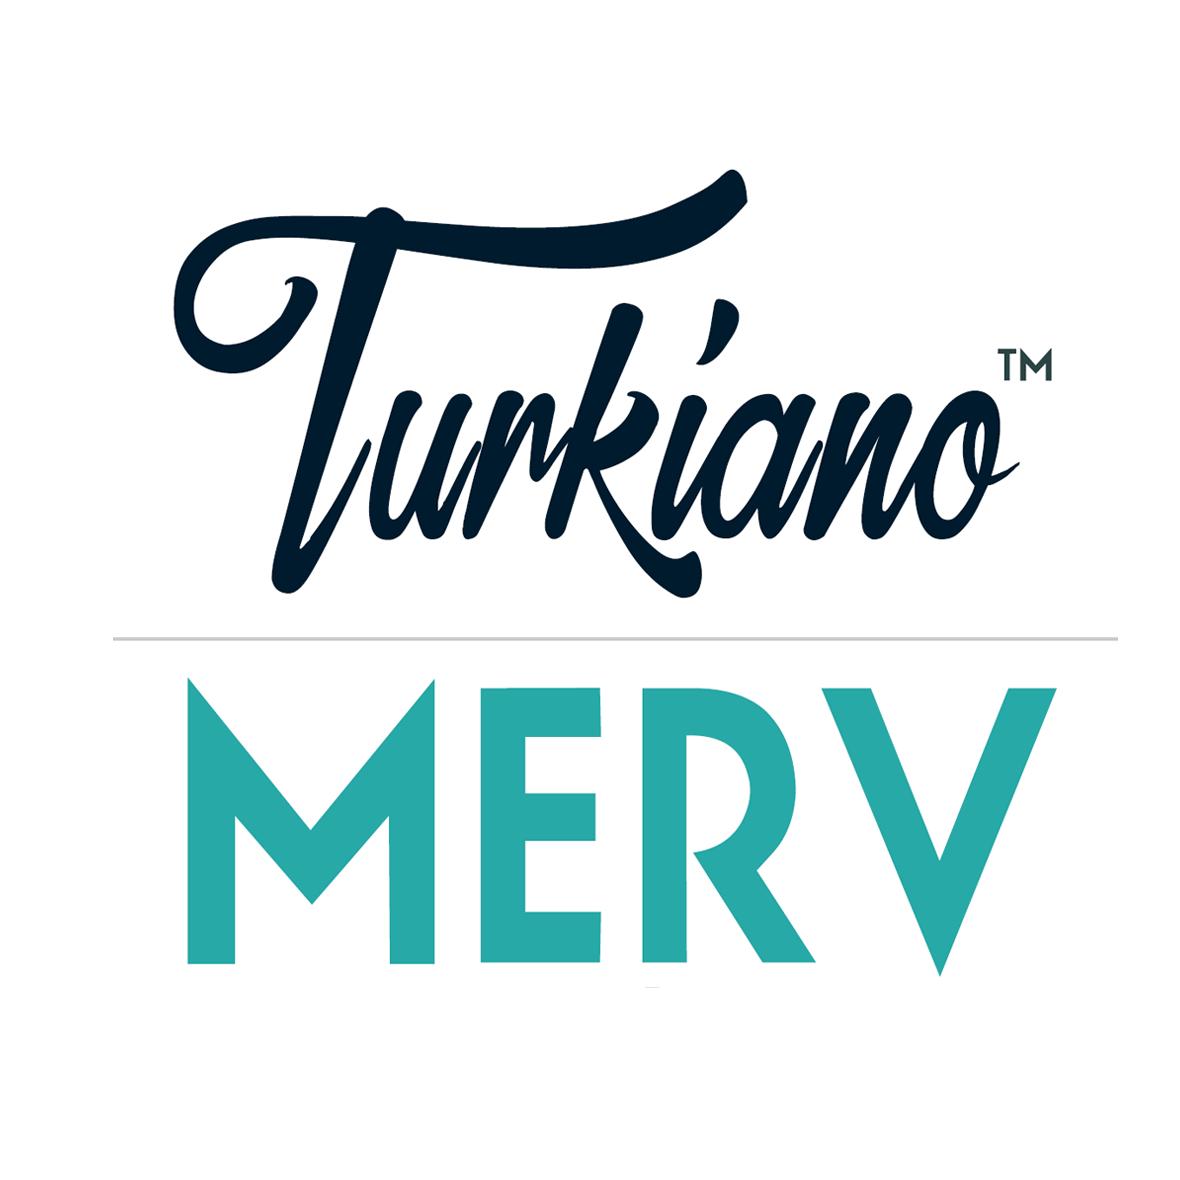 Satıcı TURKIANO MERV ART GALLERY